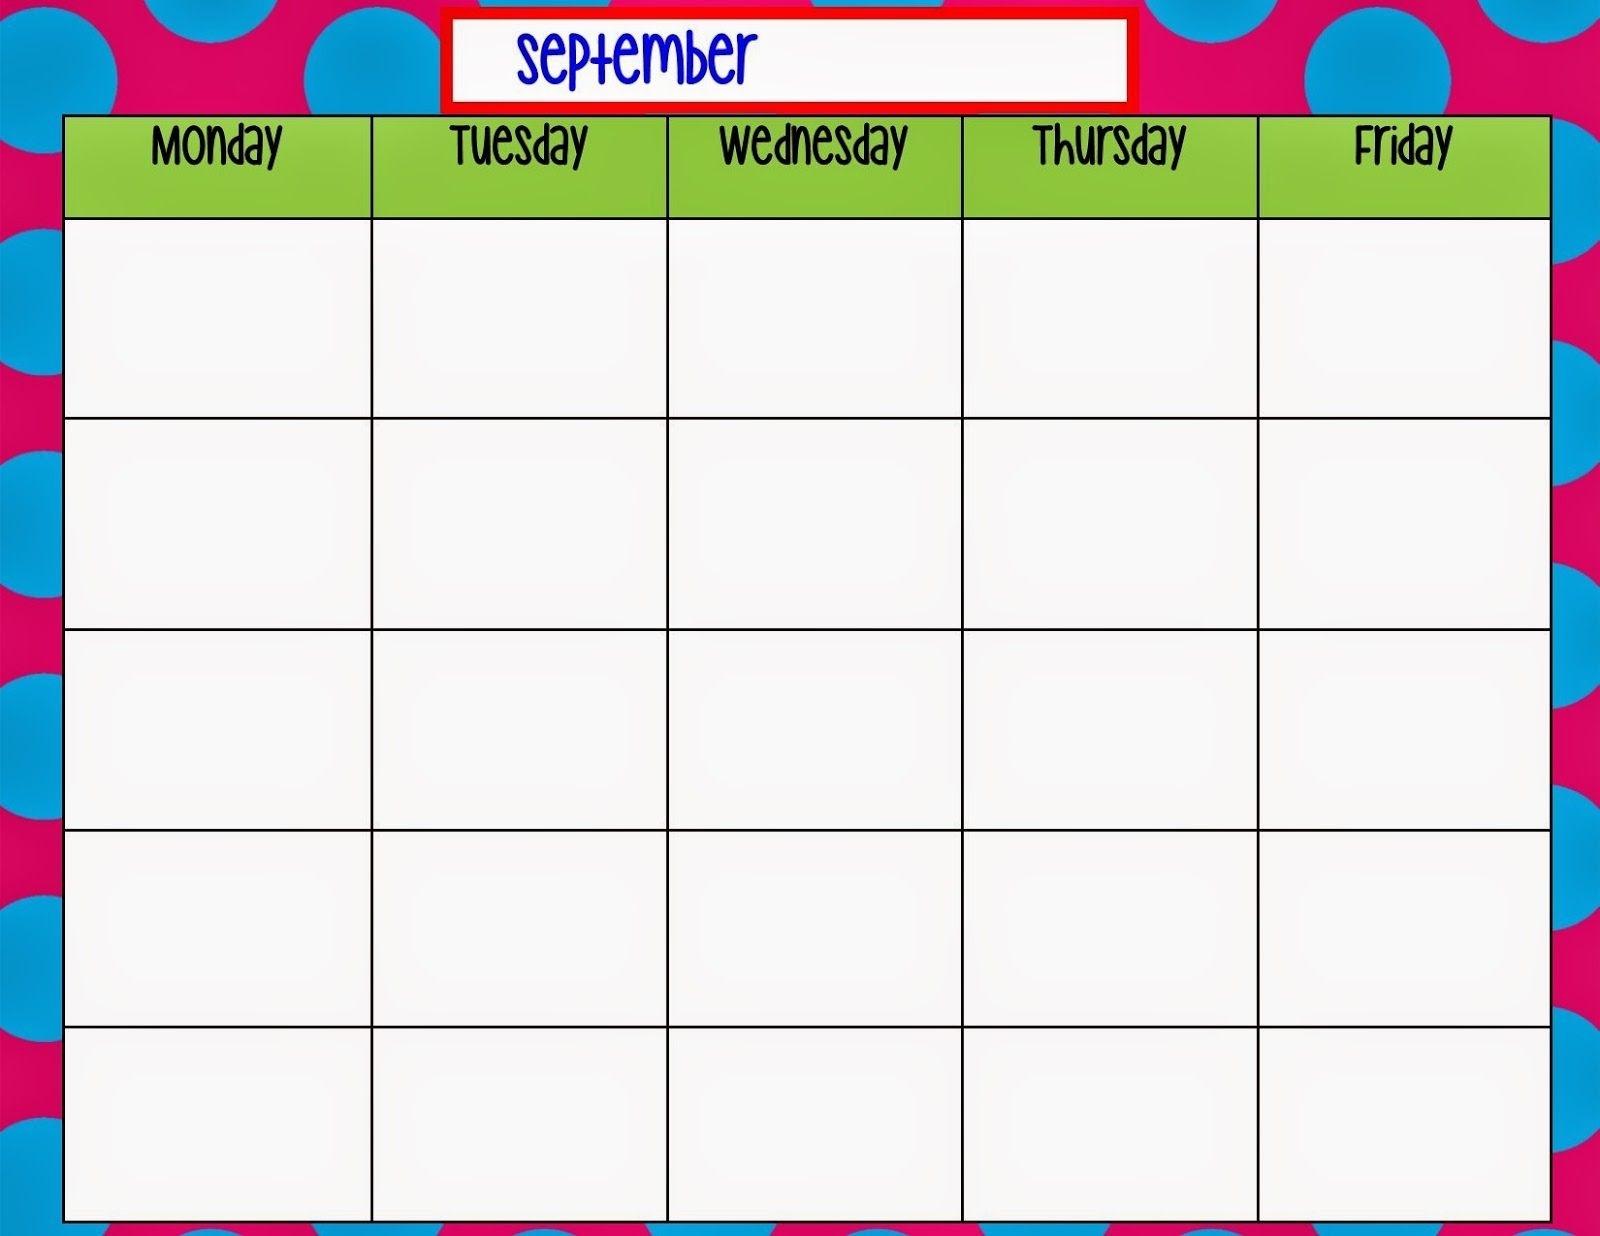 2021 Calendar That Shows Only Monday Through Friday-Free Printable Hourly Calendar 2021